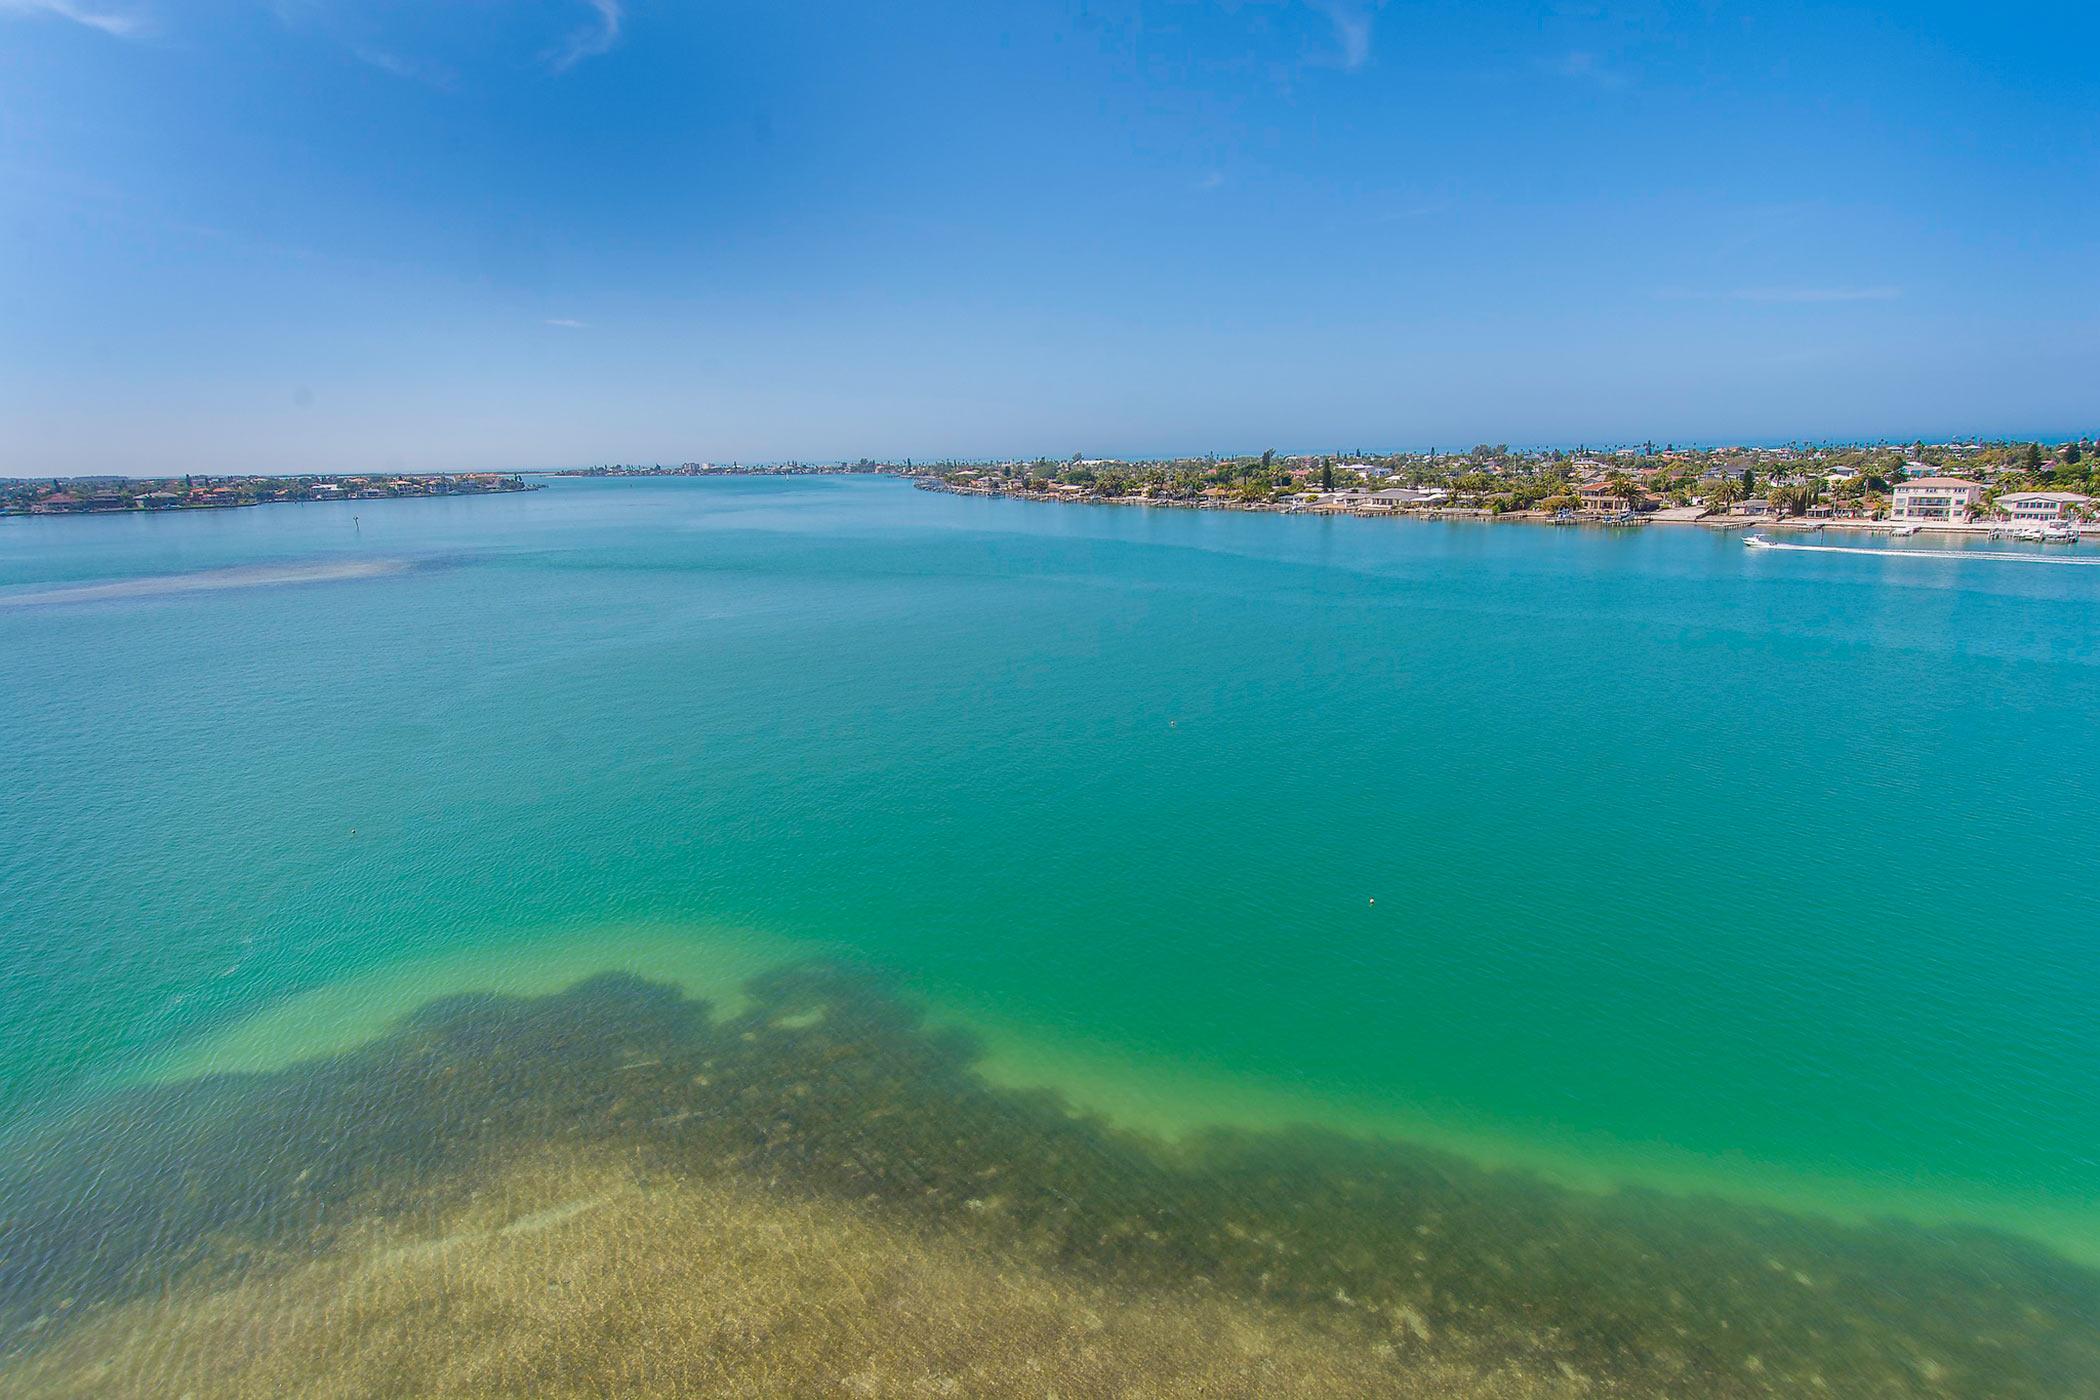 Isla del Sol and The Bayway Islands